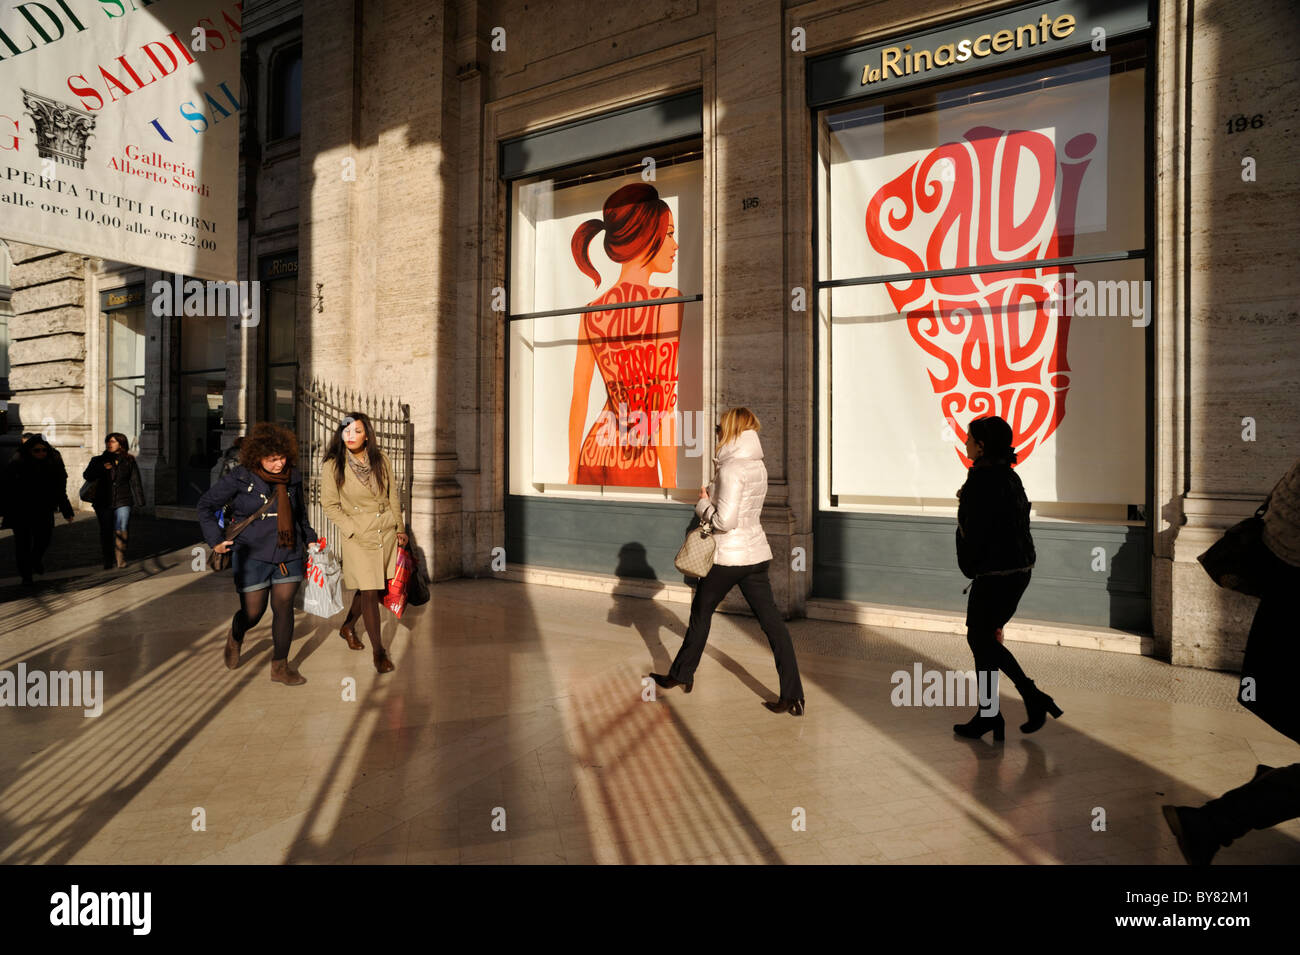 italy, rome, galleria alberto sordi, galleria colonna, shop window, sales, people shopping - Stock Image